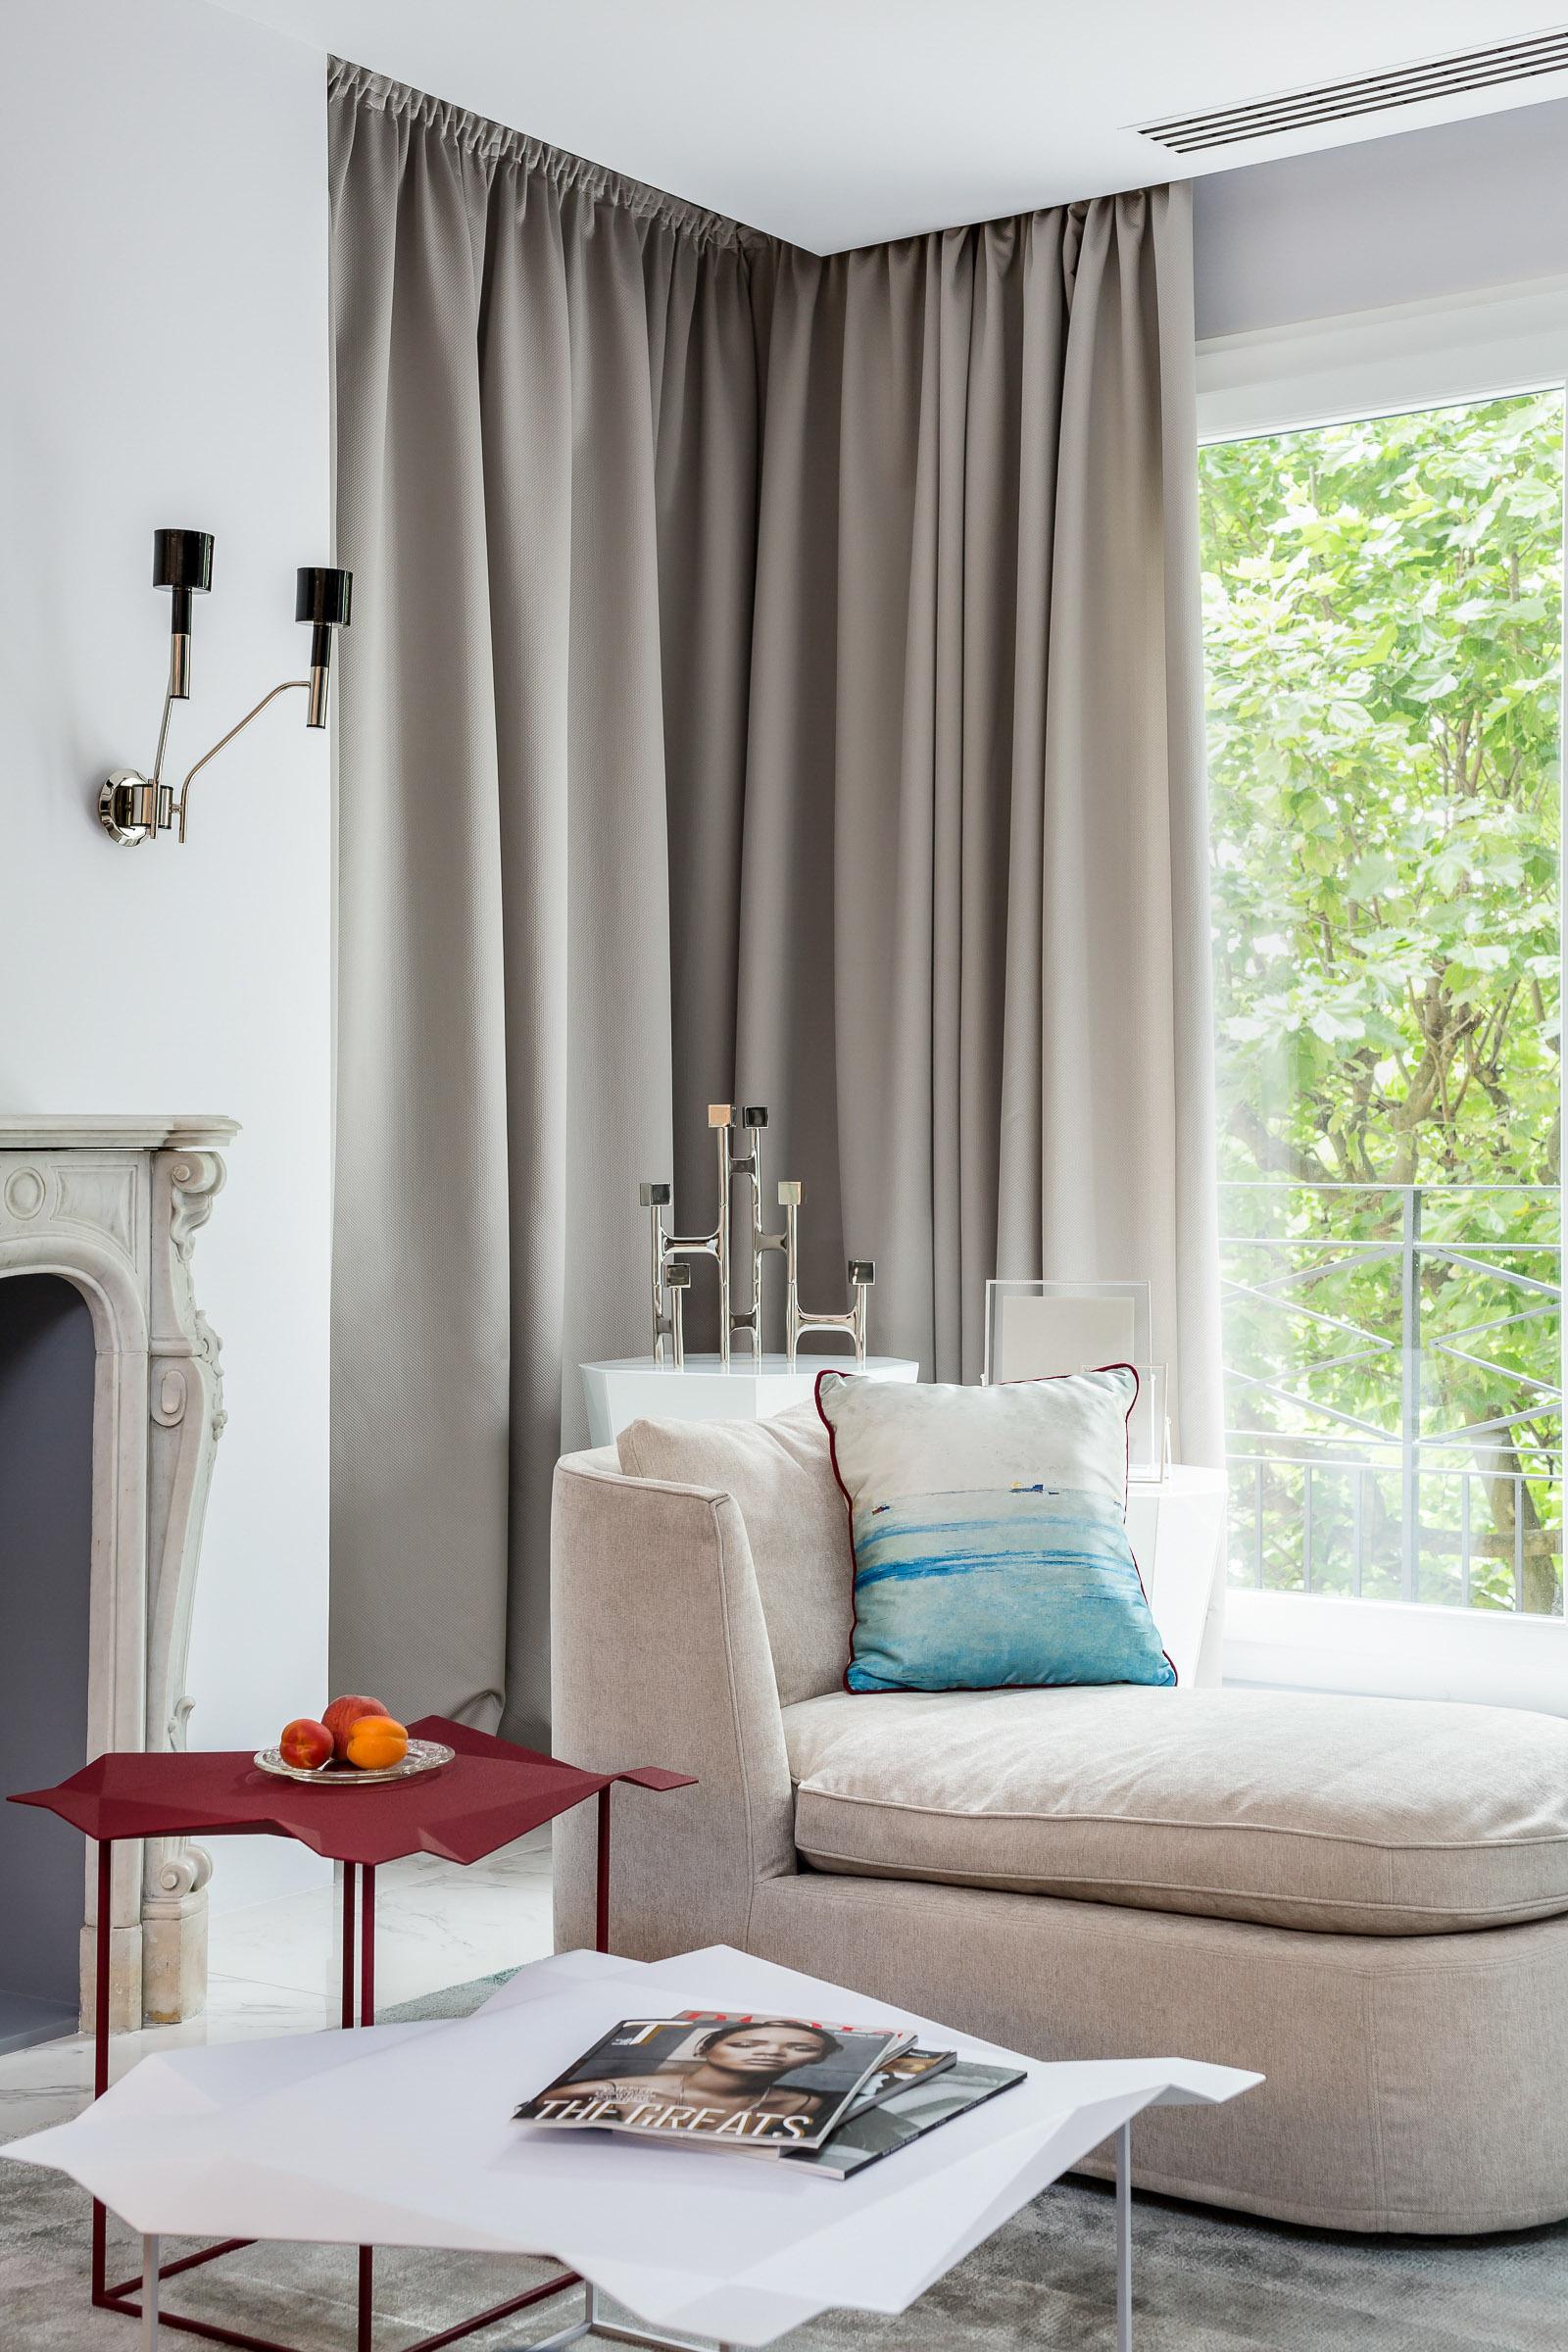 Belle Nouvelle Interior Design Paris, France - Nika Vorotyntseva